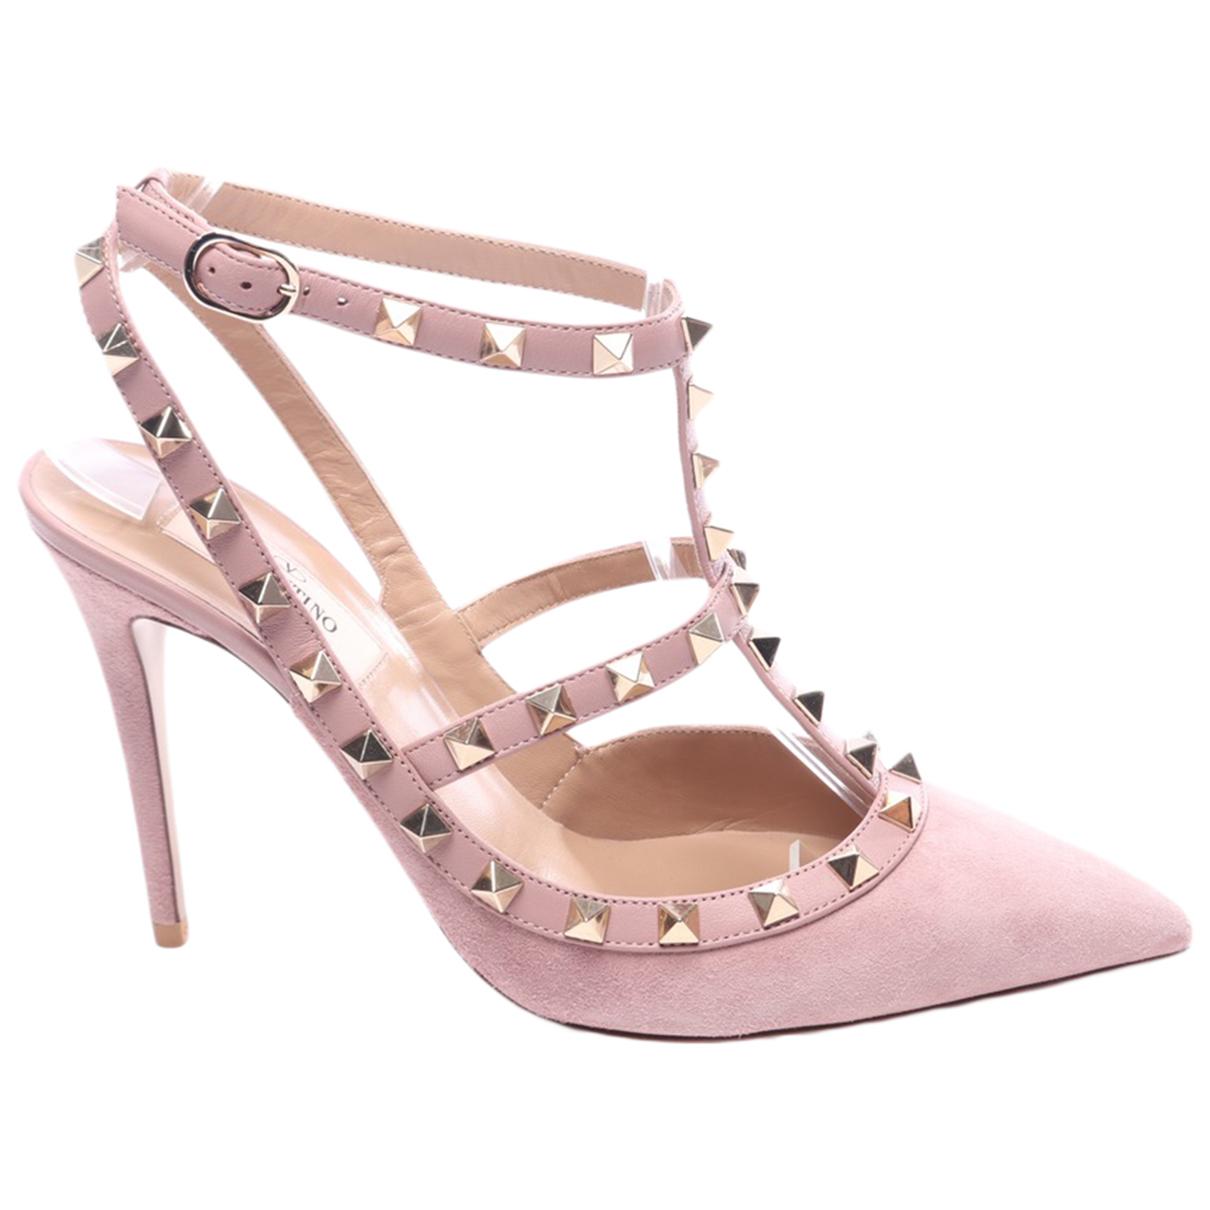 Valentino Garavani - Escarpins   pour femme en cuir - rose